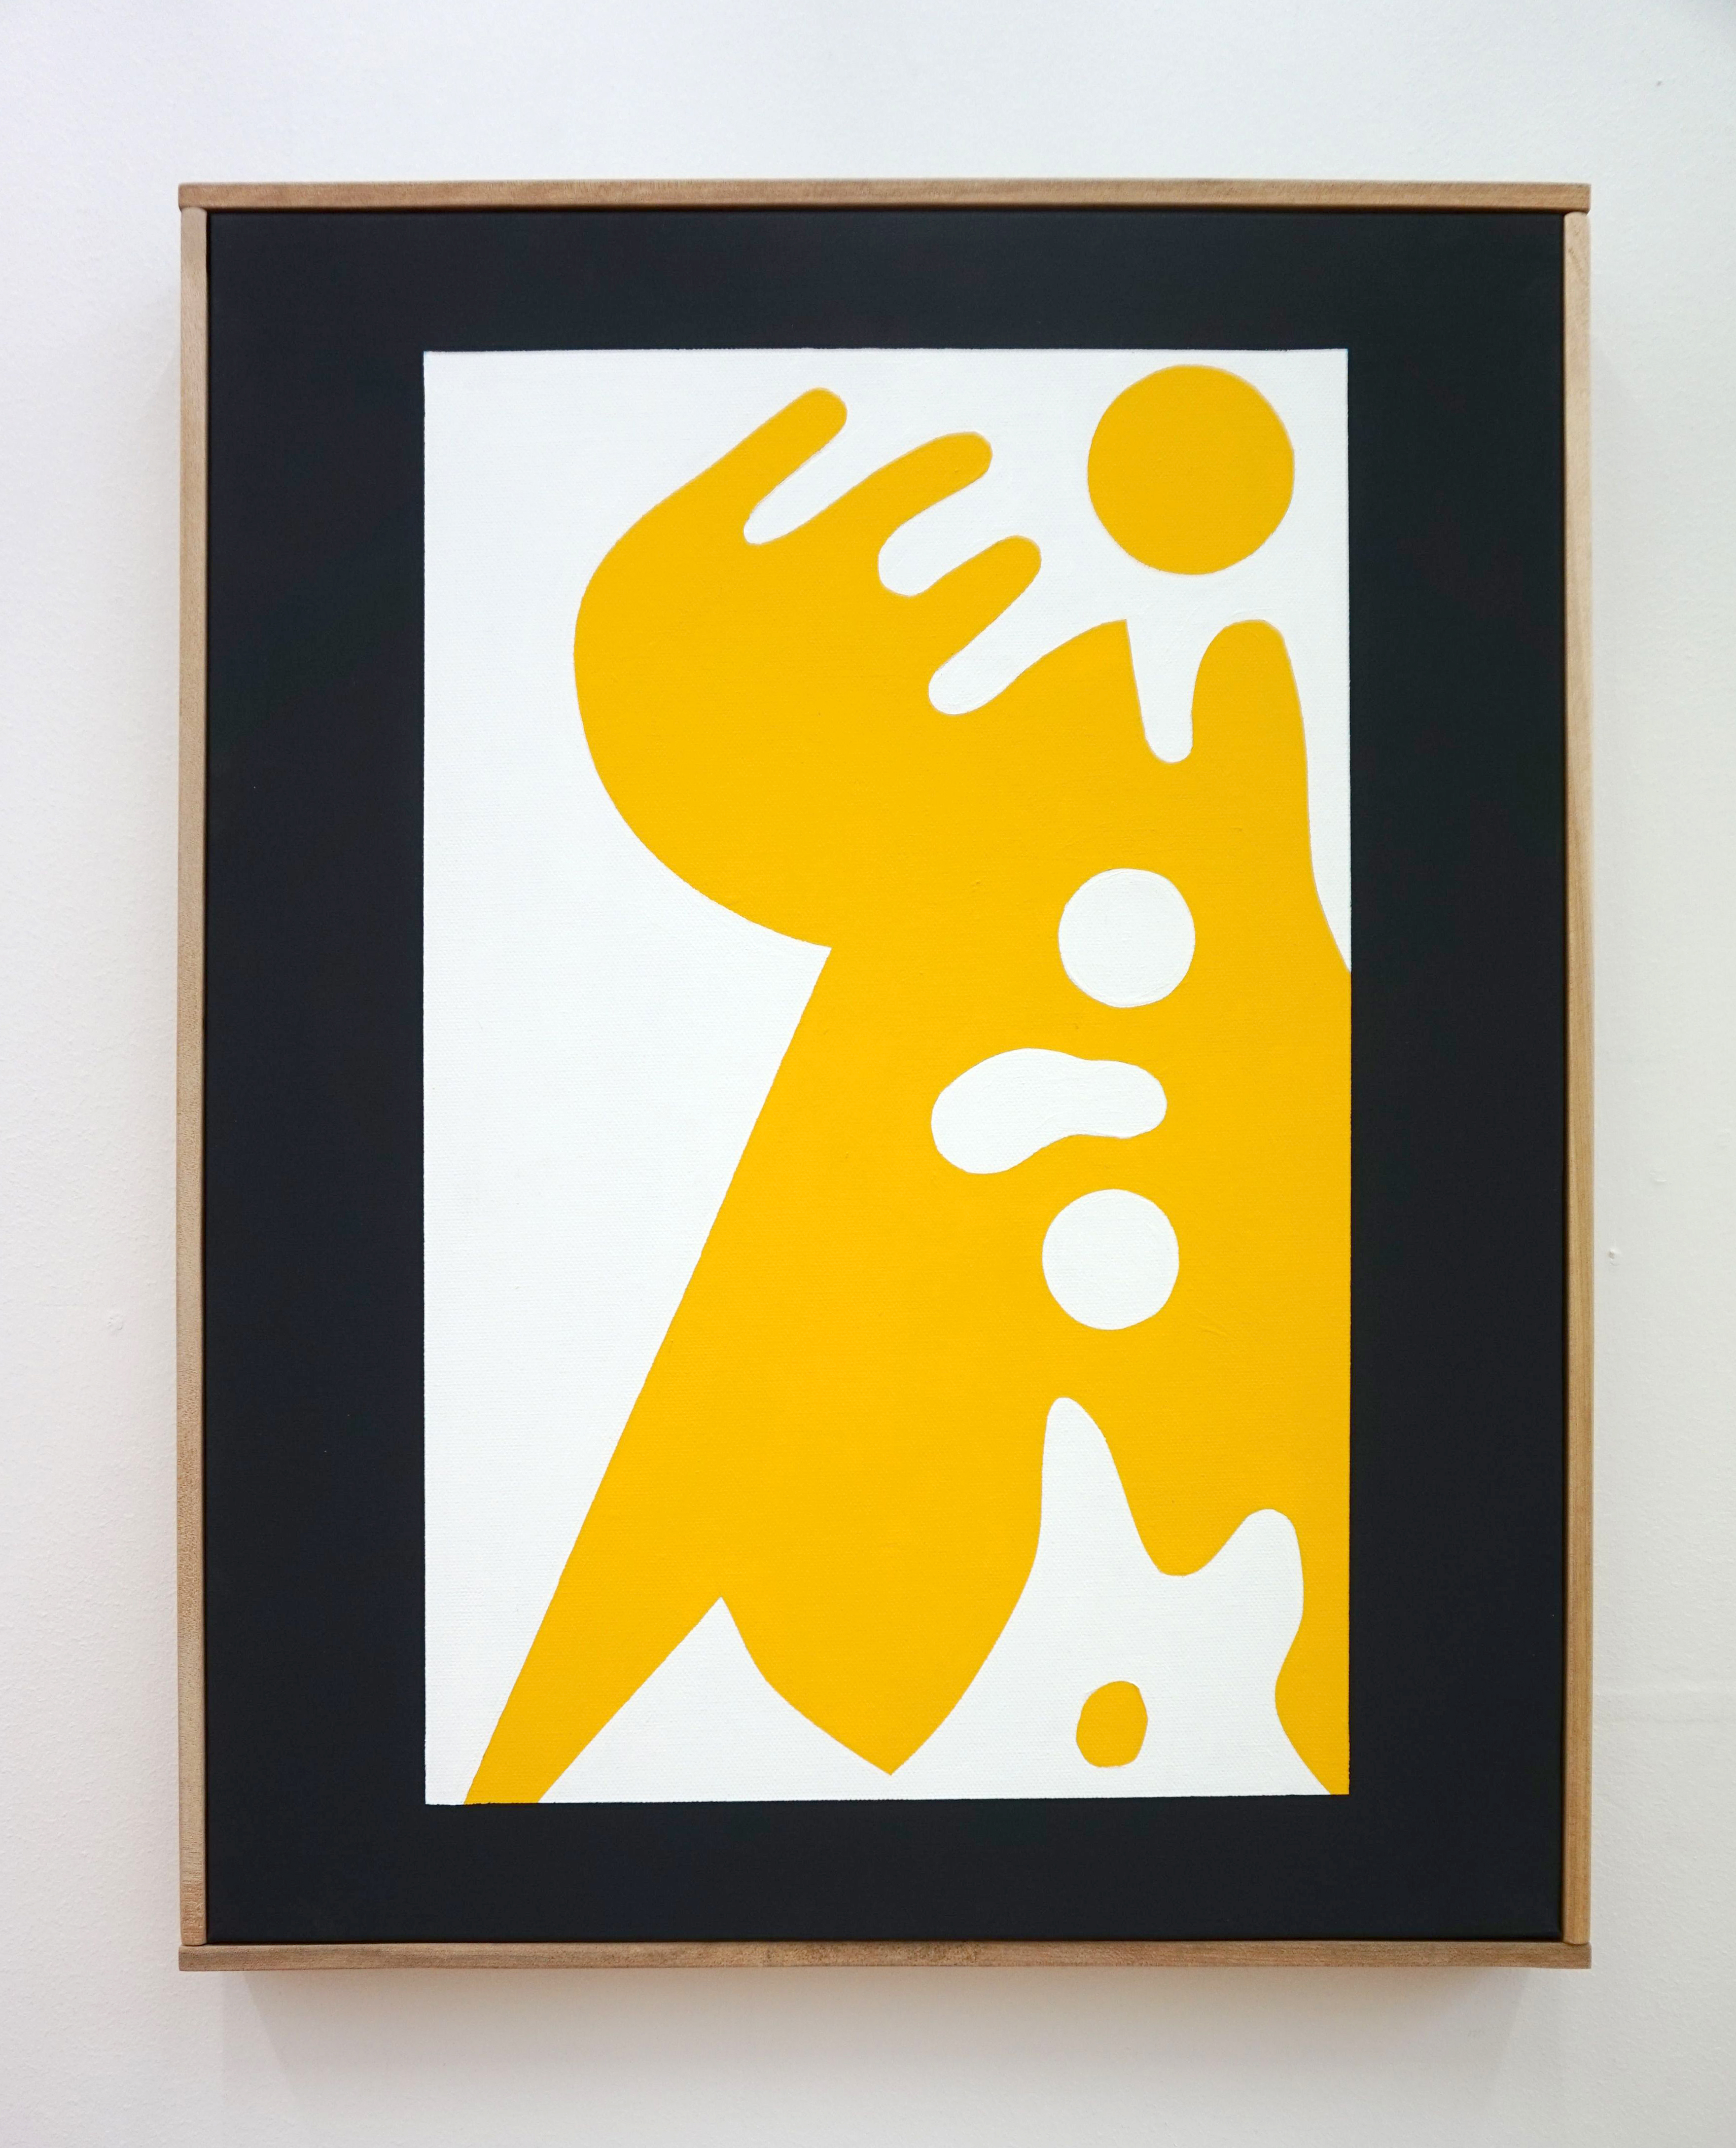 Visual Artwork: Lemon by artist and creator Robbie Simon